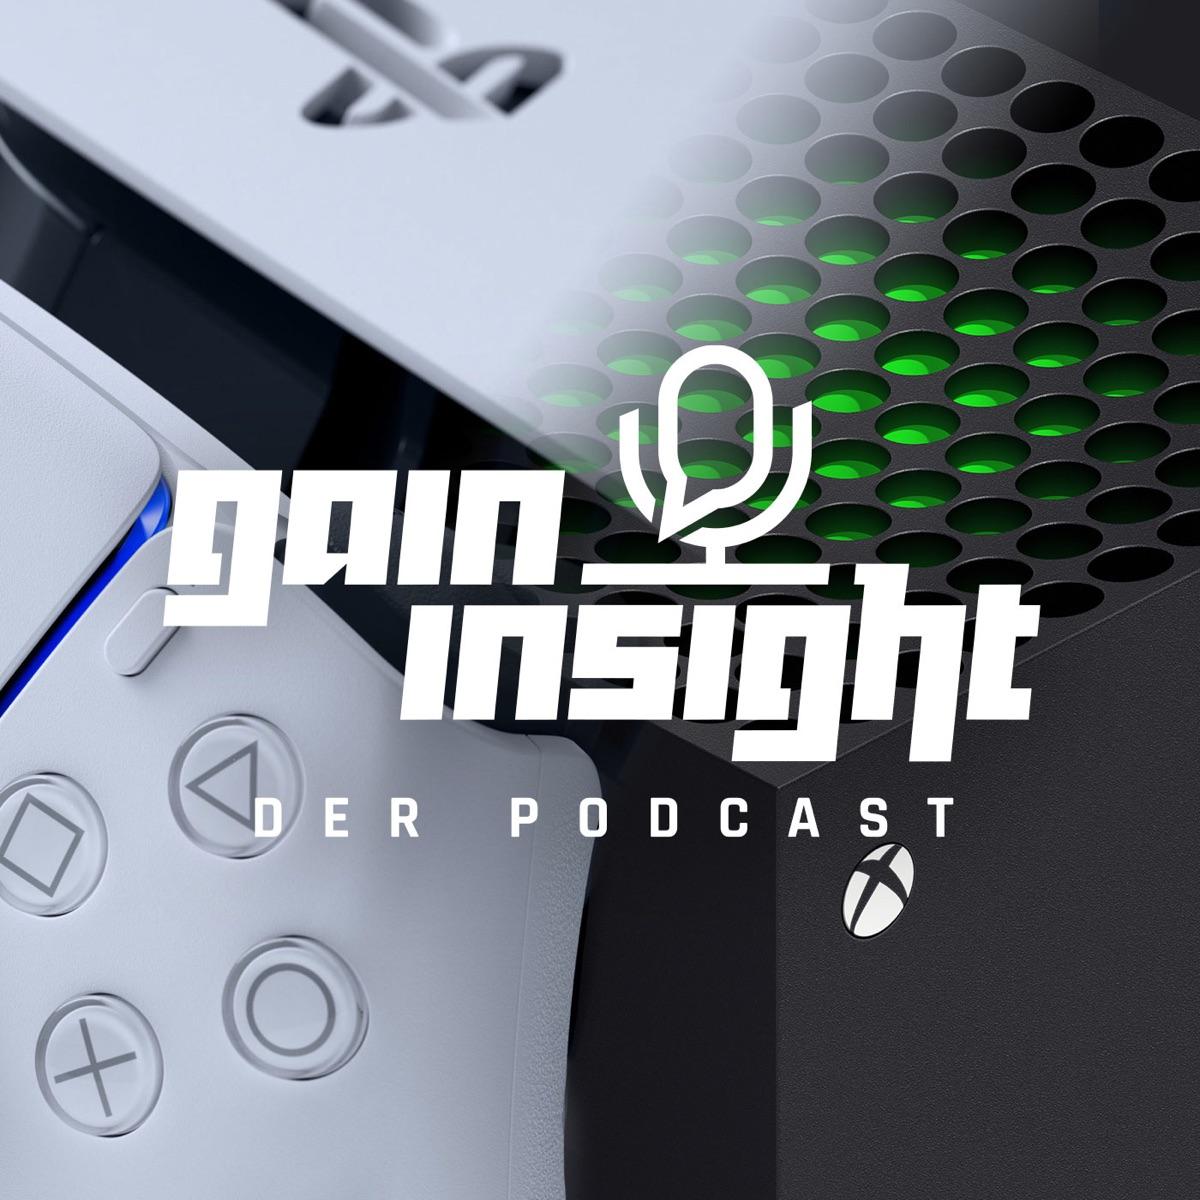 GAIN Insight - Der Podcast